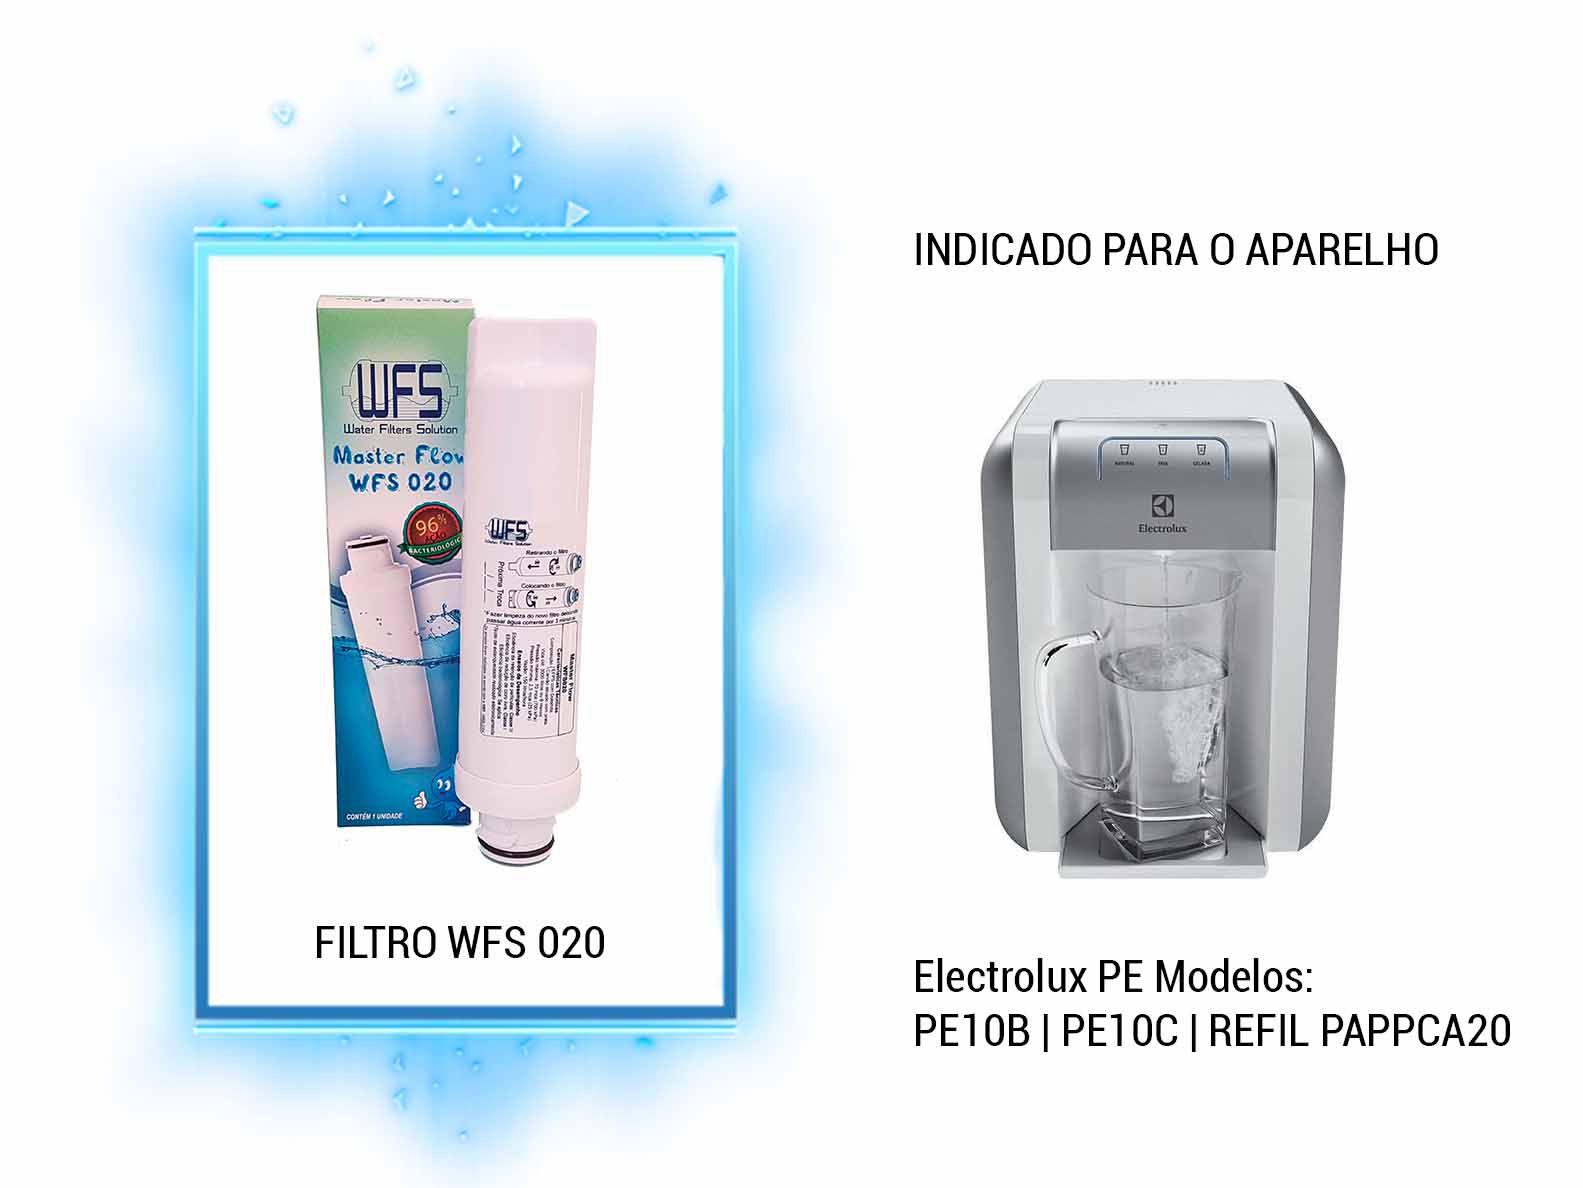 Refil Purificador Electrolux PE   Wfs 020  Master Flow